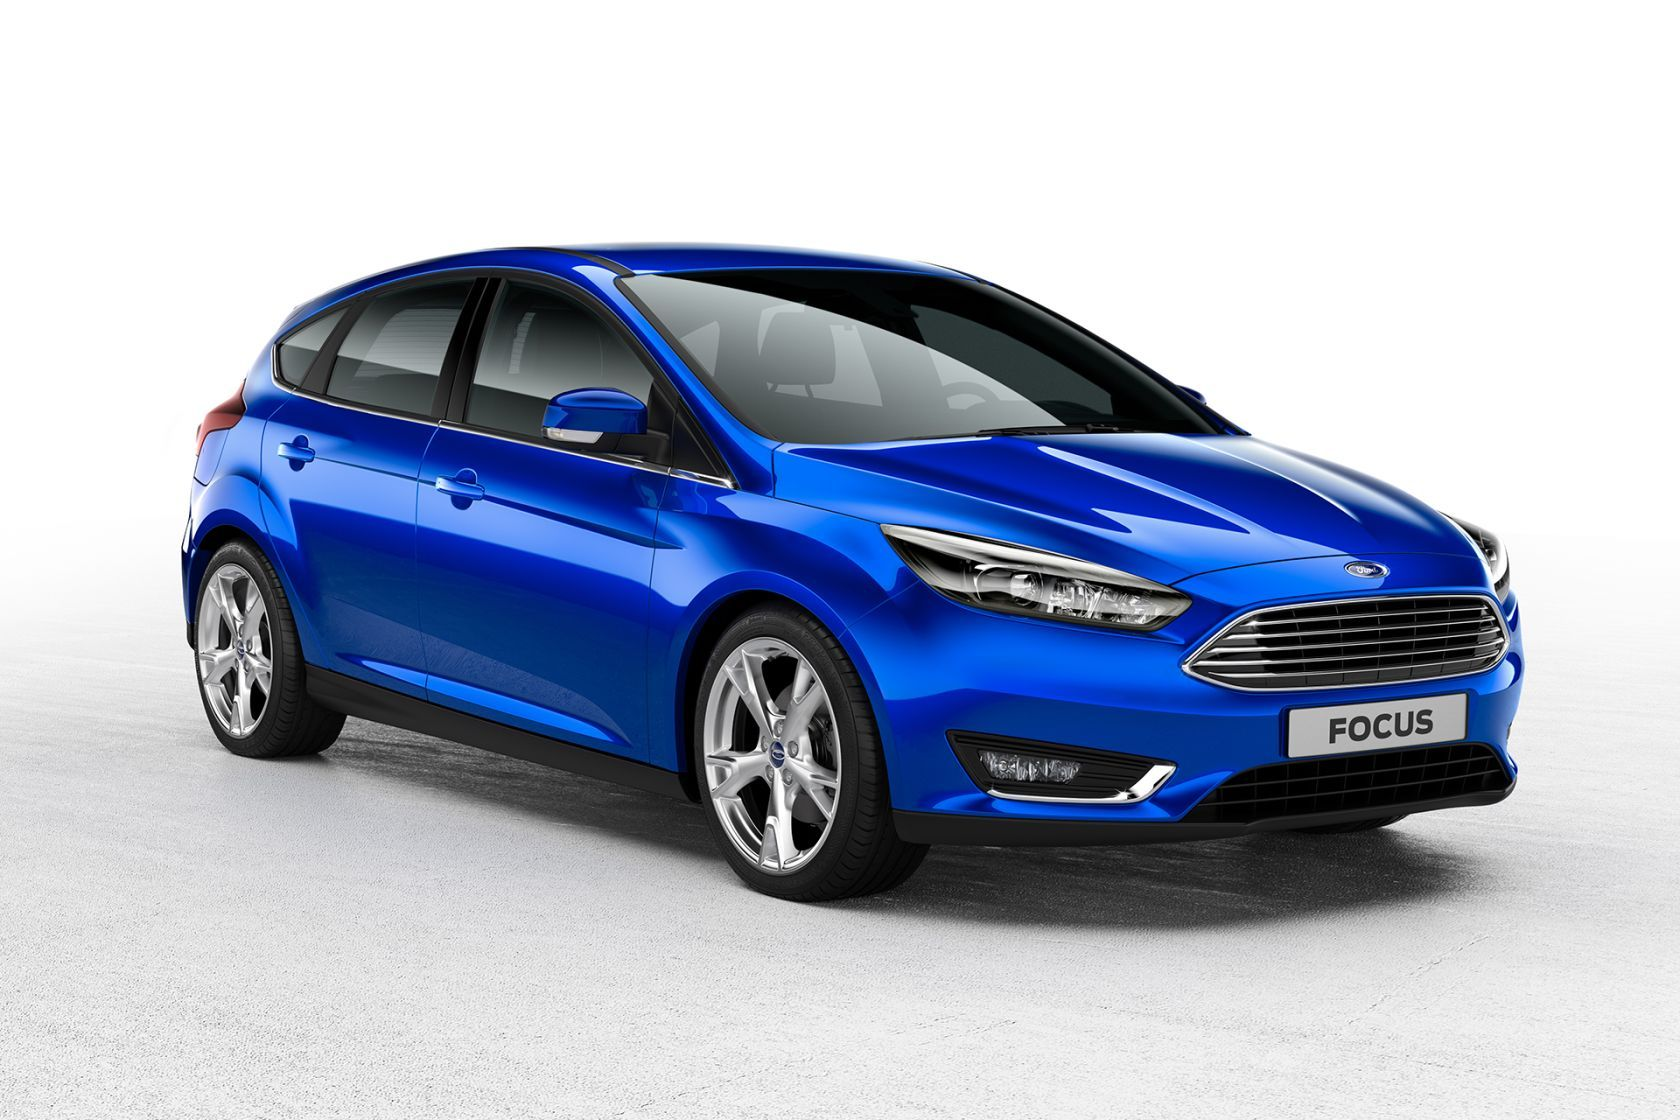 Focus-hatchback-2015-05